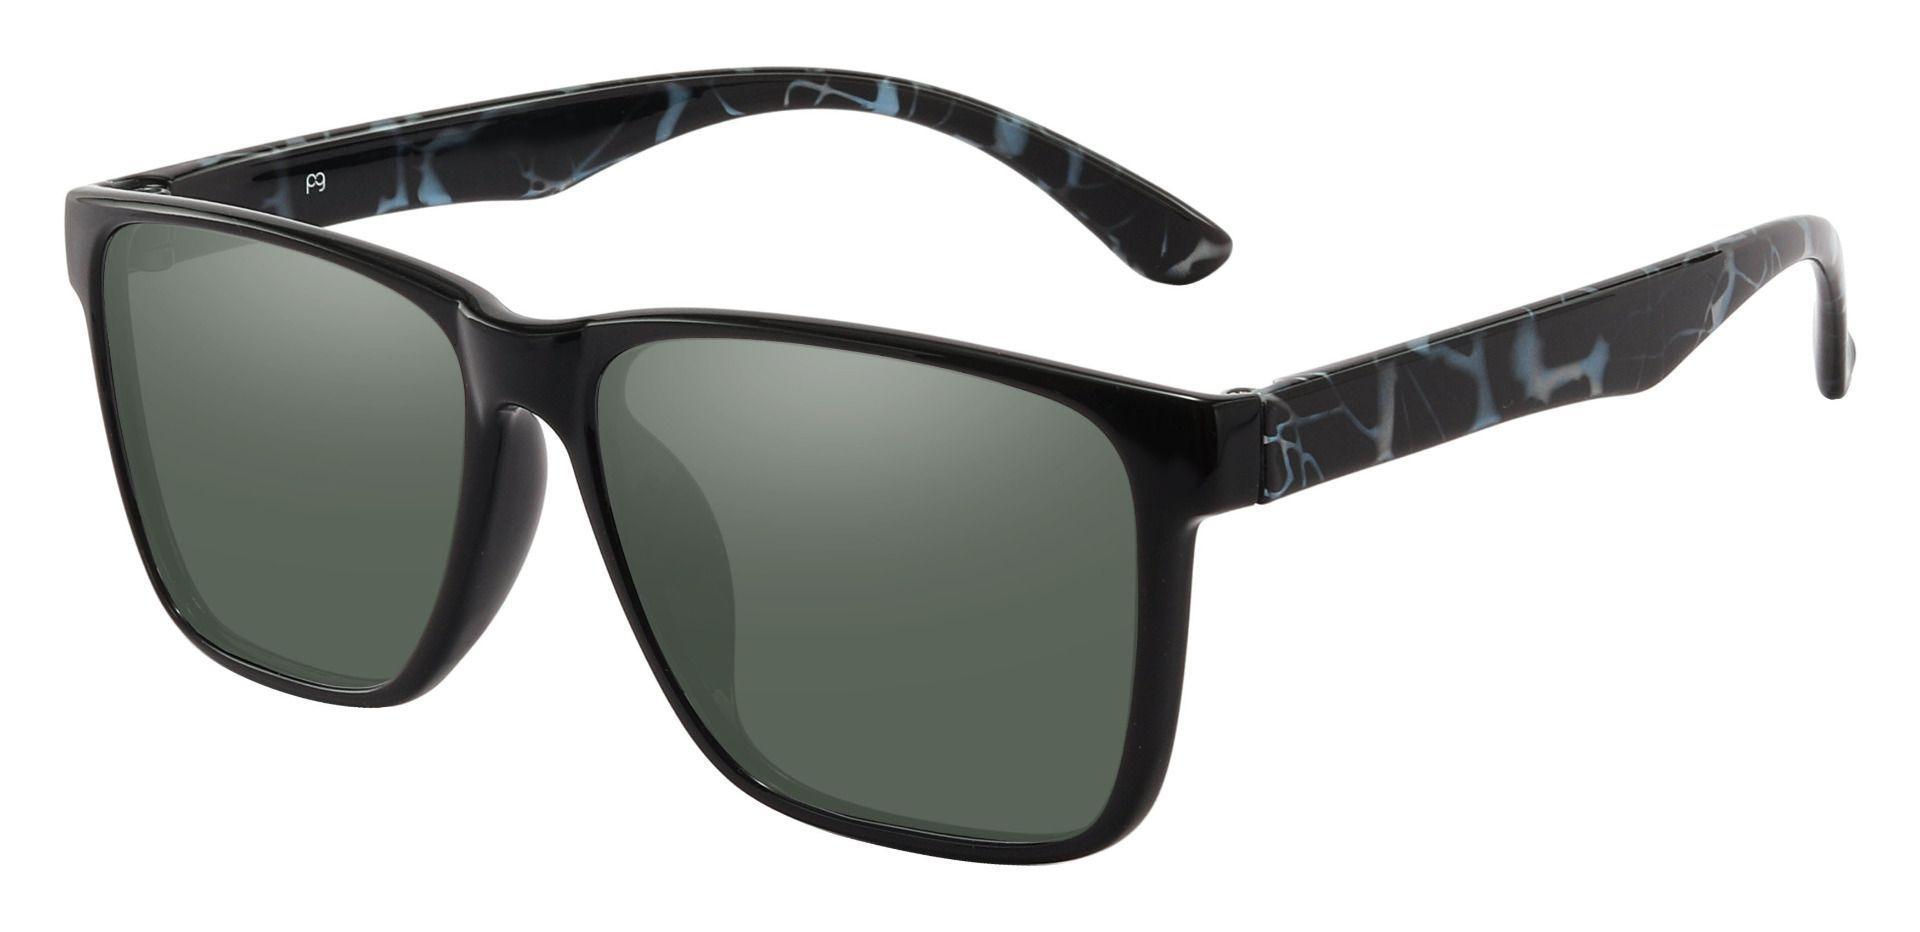 Barnum Square Prescription Sunglasses - Black Frame With Green Lenses